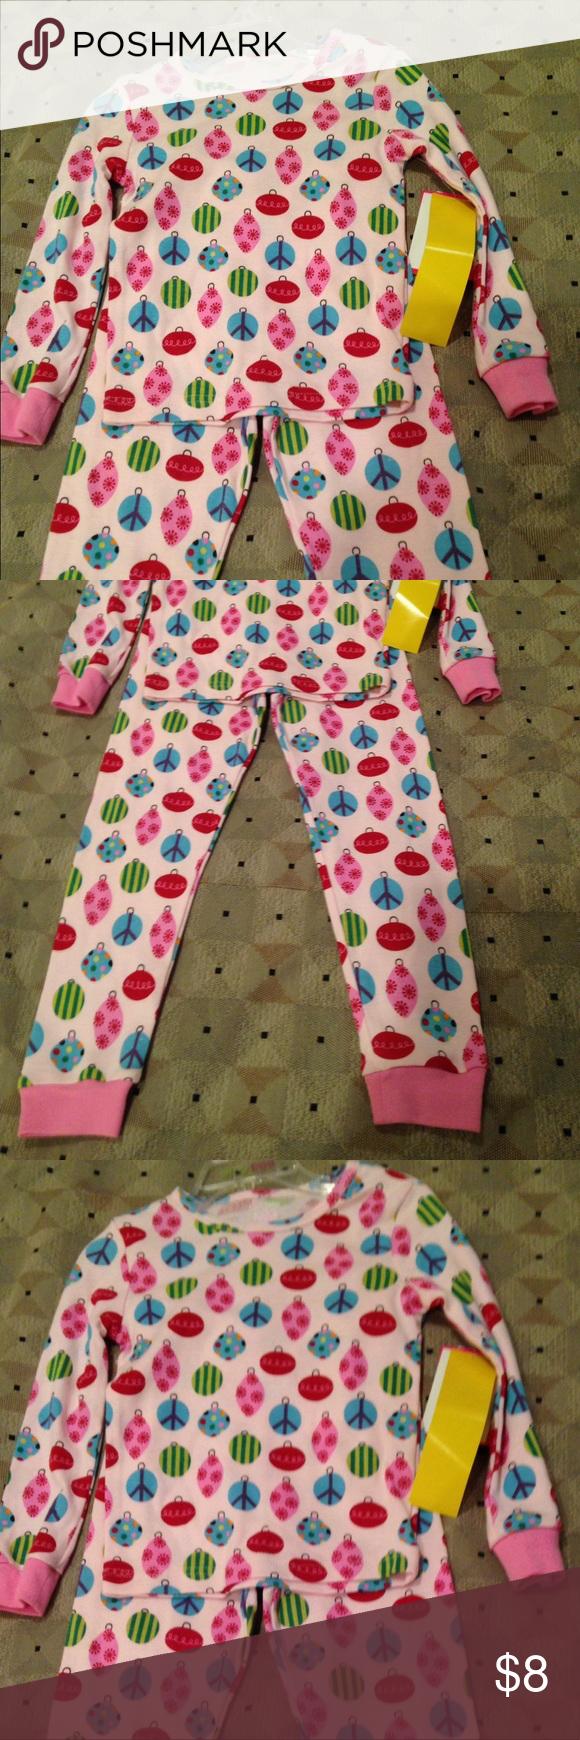 Amy Coe 2 pieces kid pajamas Cute 2 pieces Amy Coe size 4T color pink with ornaments Amy Coe Pajamas Pajama Sets